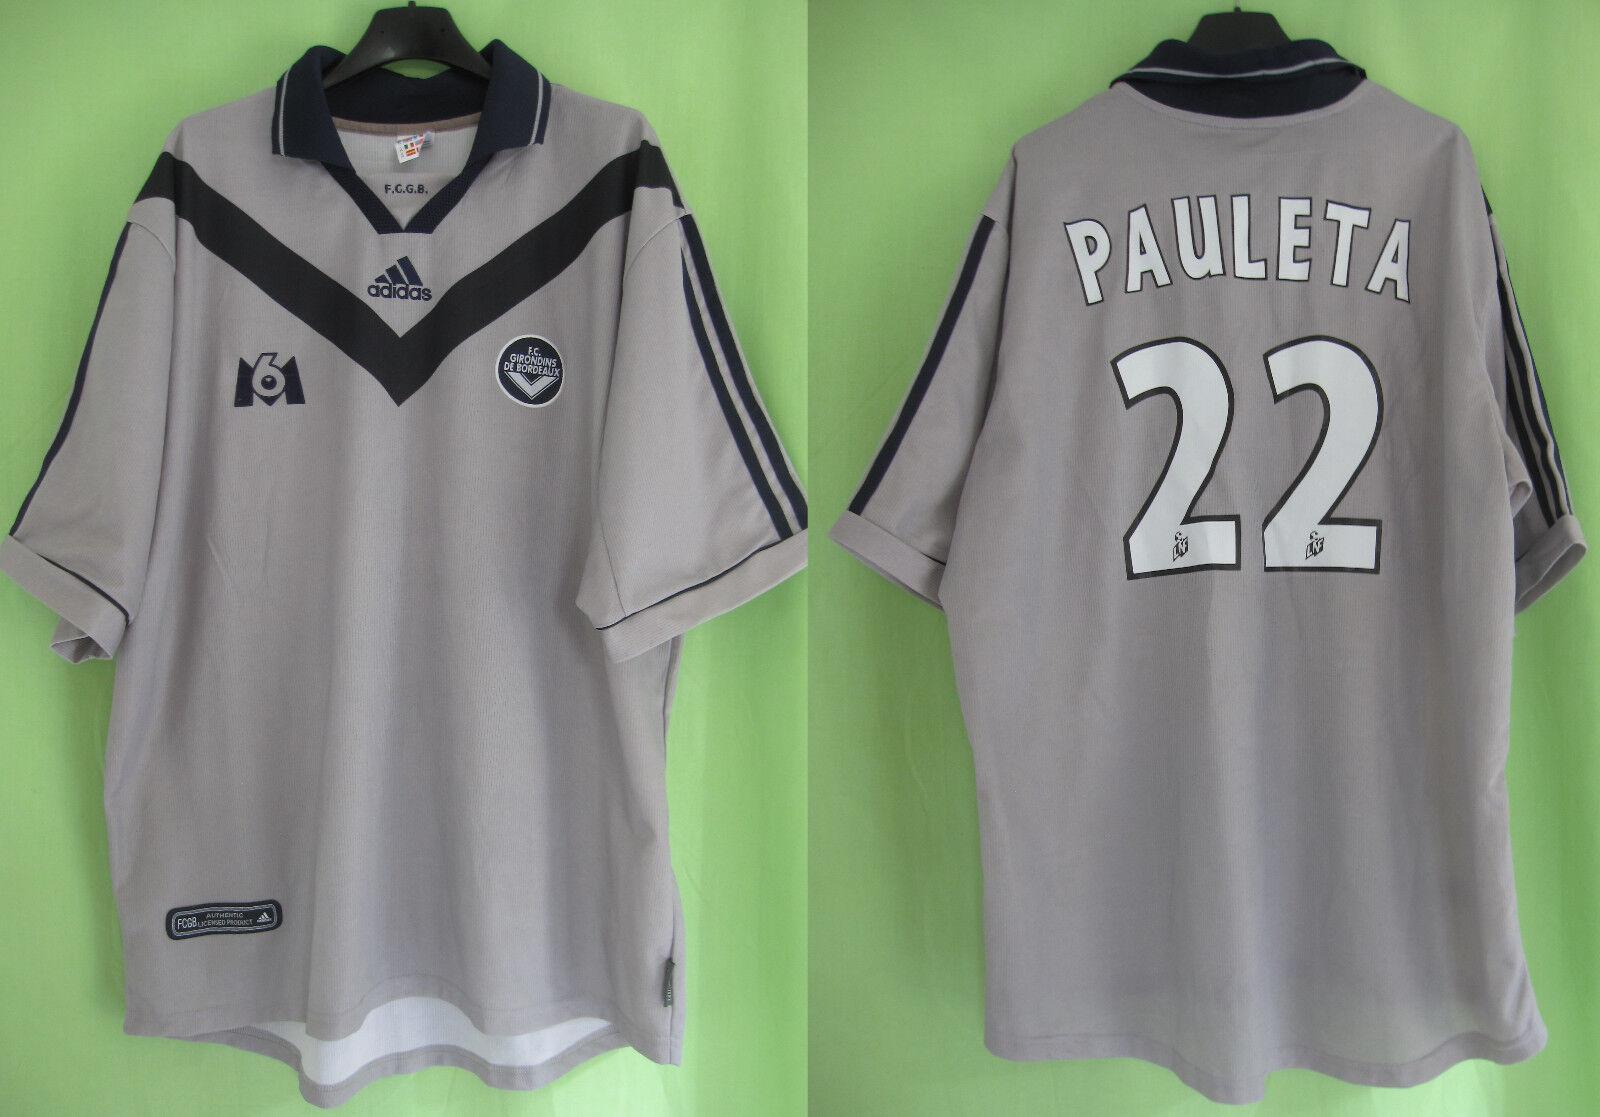 Maillot Girondins de Bordeaux Pauleta  22 Adidas Vintage Jersey football  XL